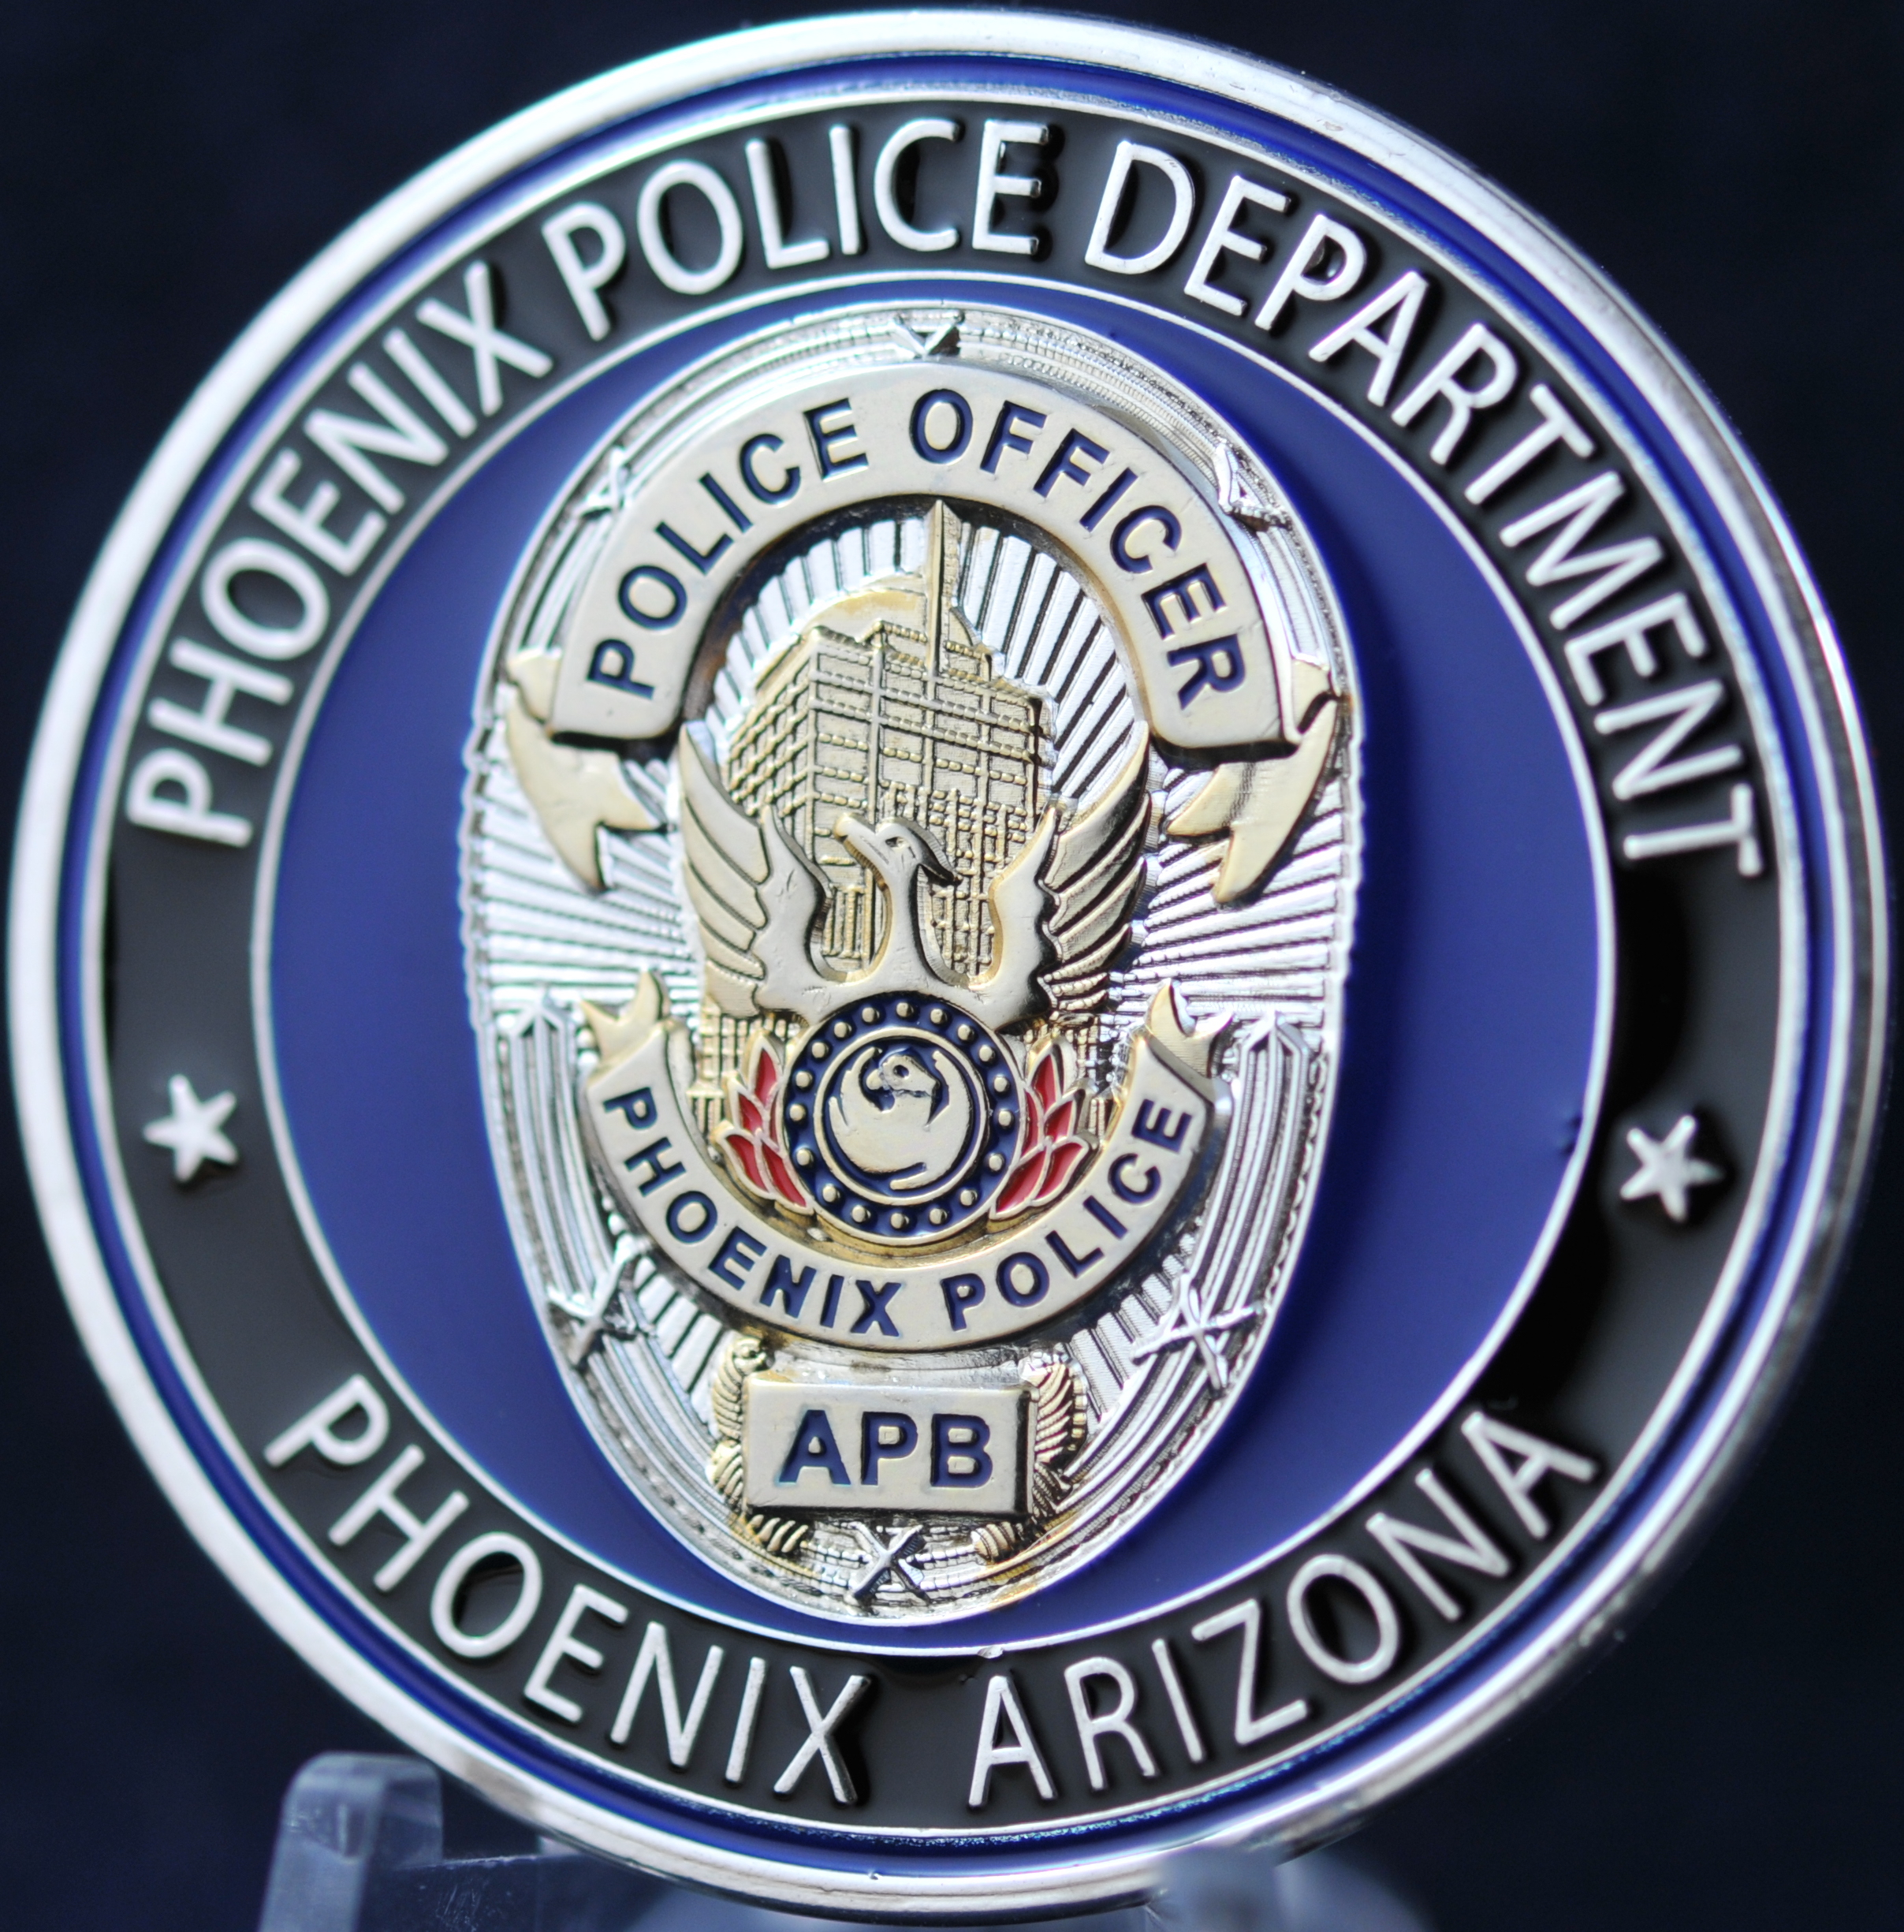 phoenix police department airport bureau. Black Bedroom Furniture Sets. Home Design Ideas